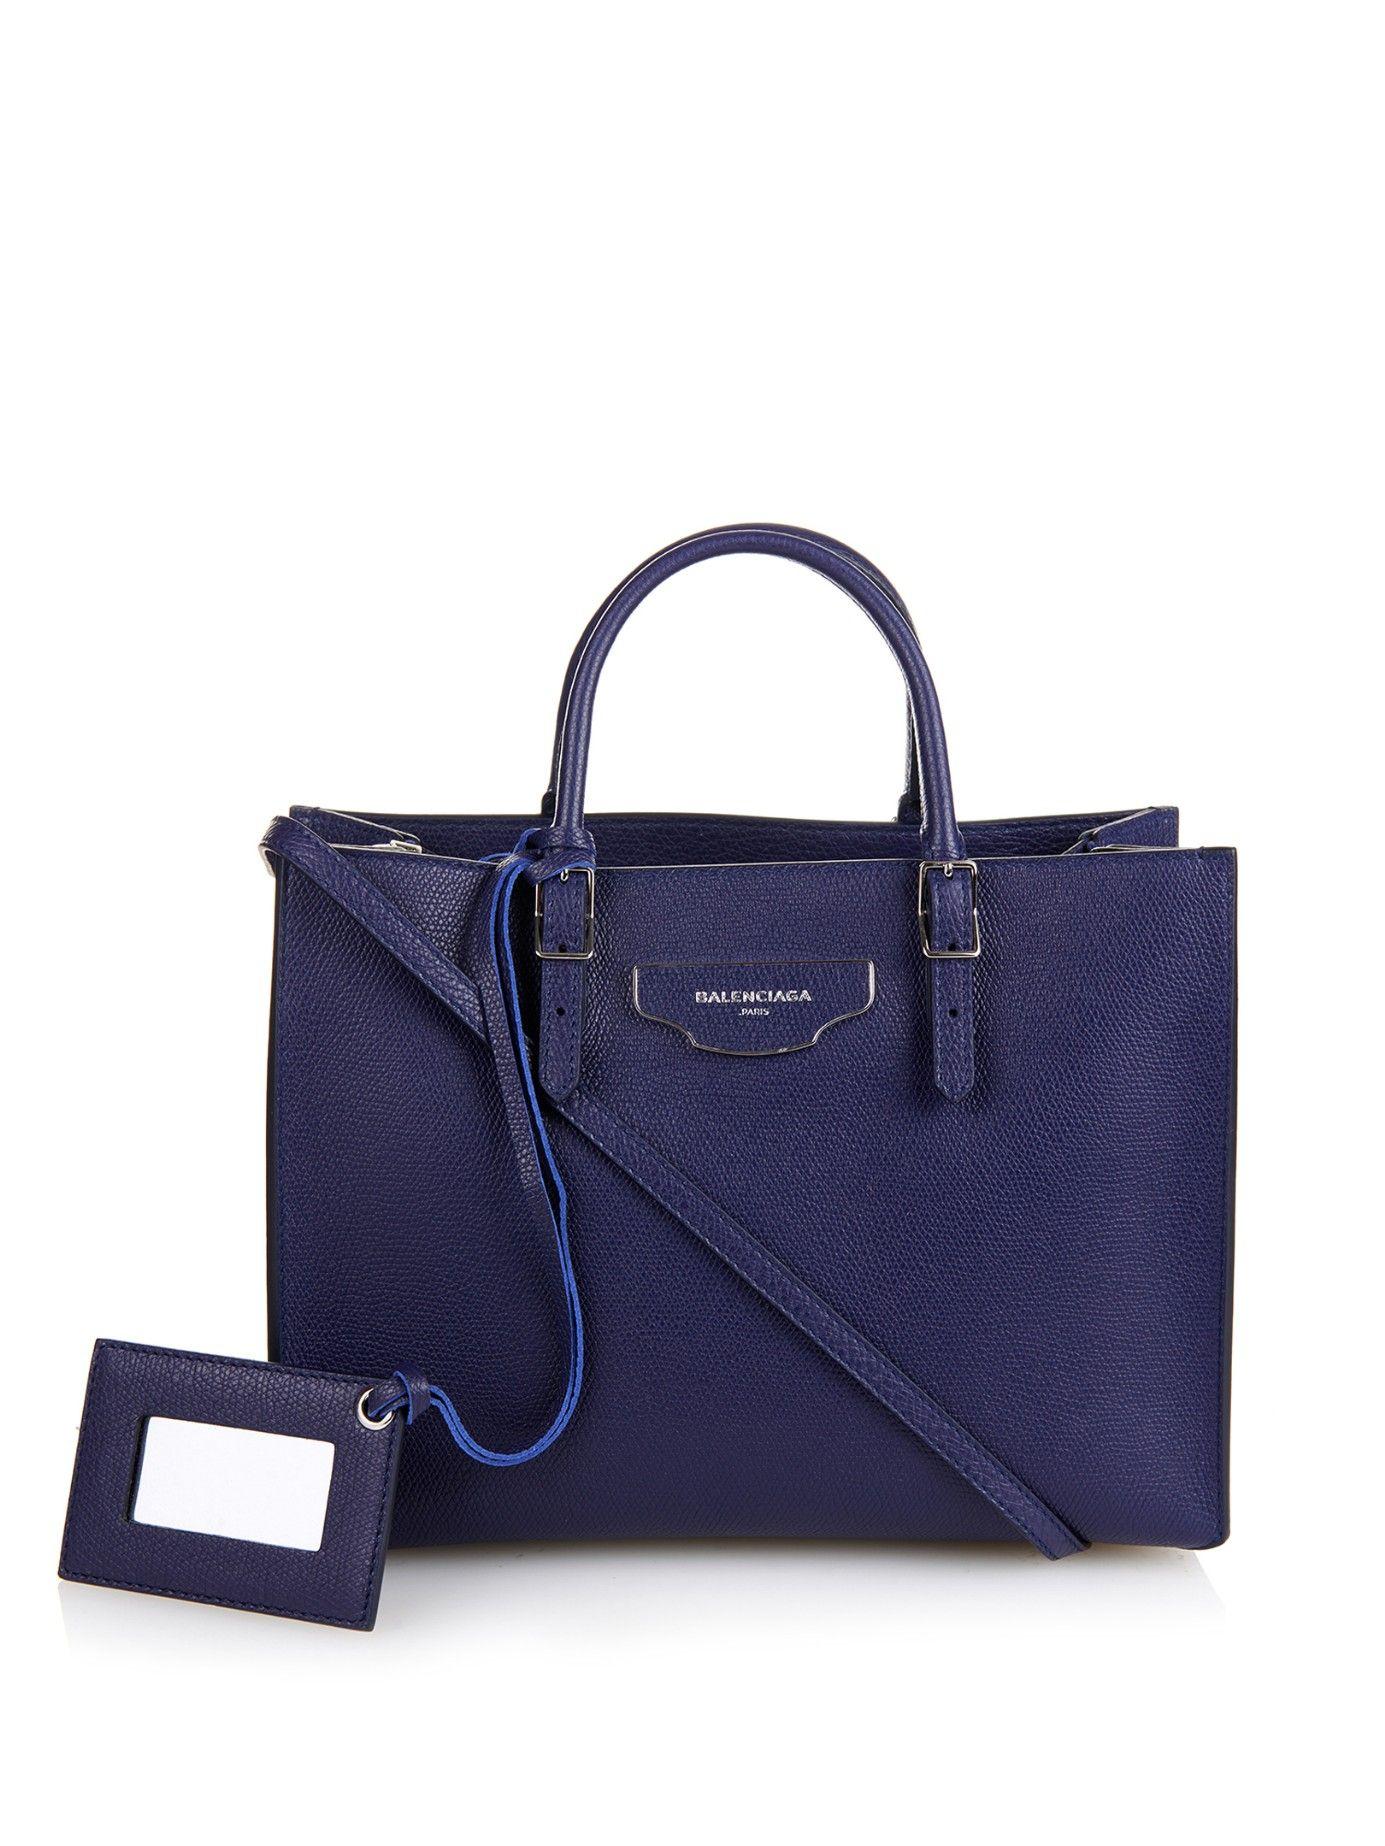 Papier A6 Plate Leather Cross Body Bag Balenciaga Matchesfashion Com Uk